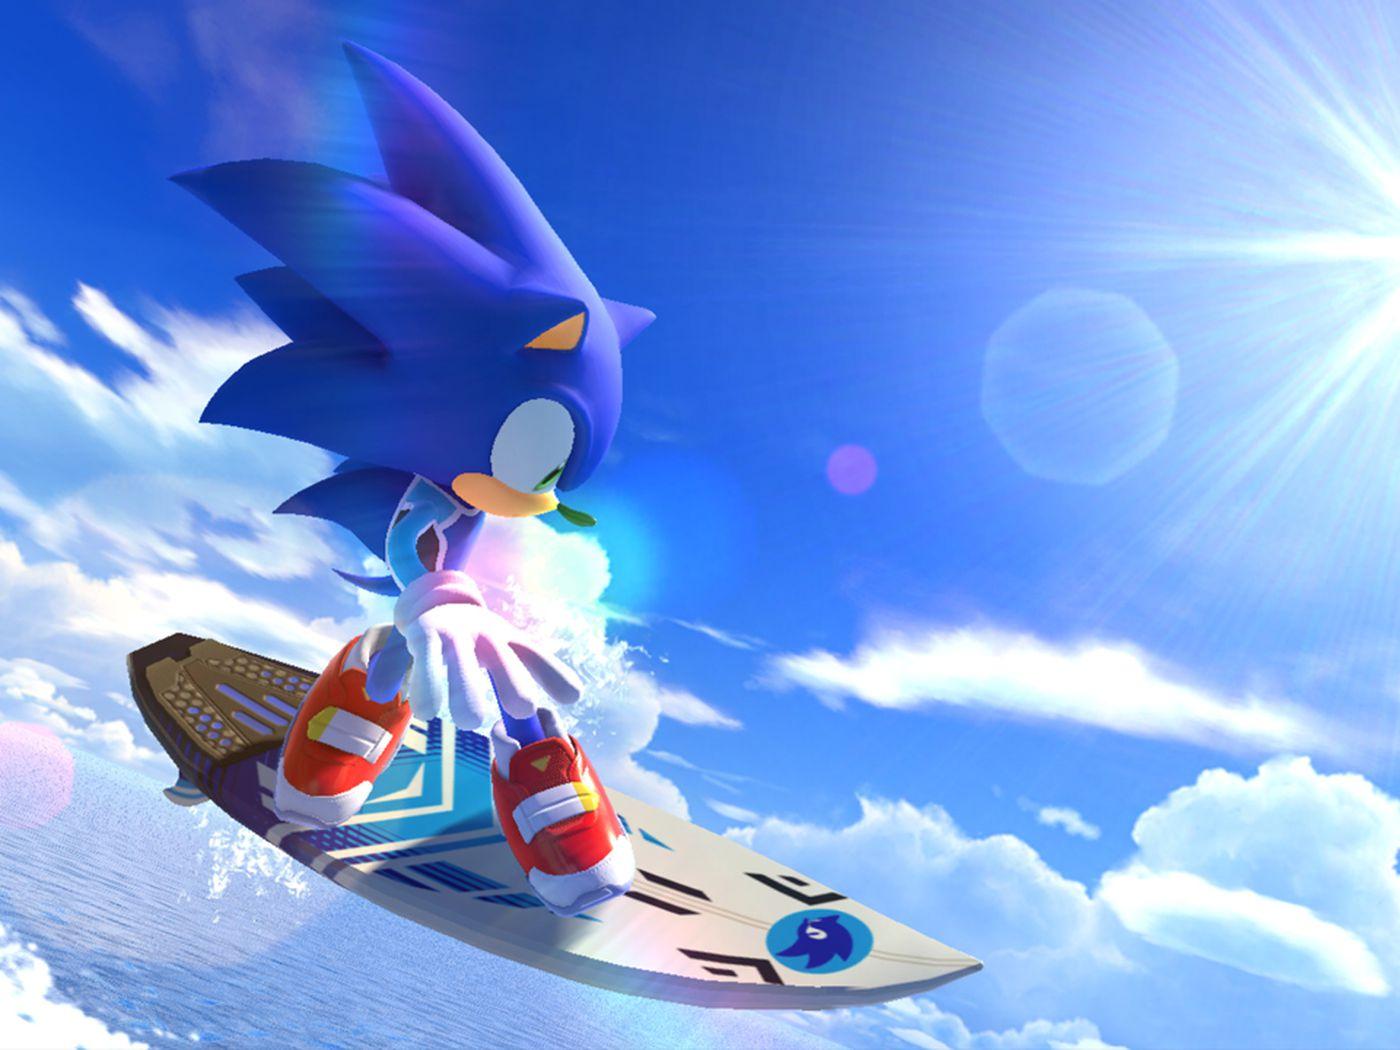 Why Is Sega So Afraid Of Showing Sonic S Feet Polygon